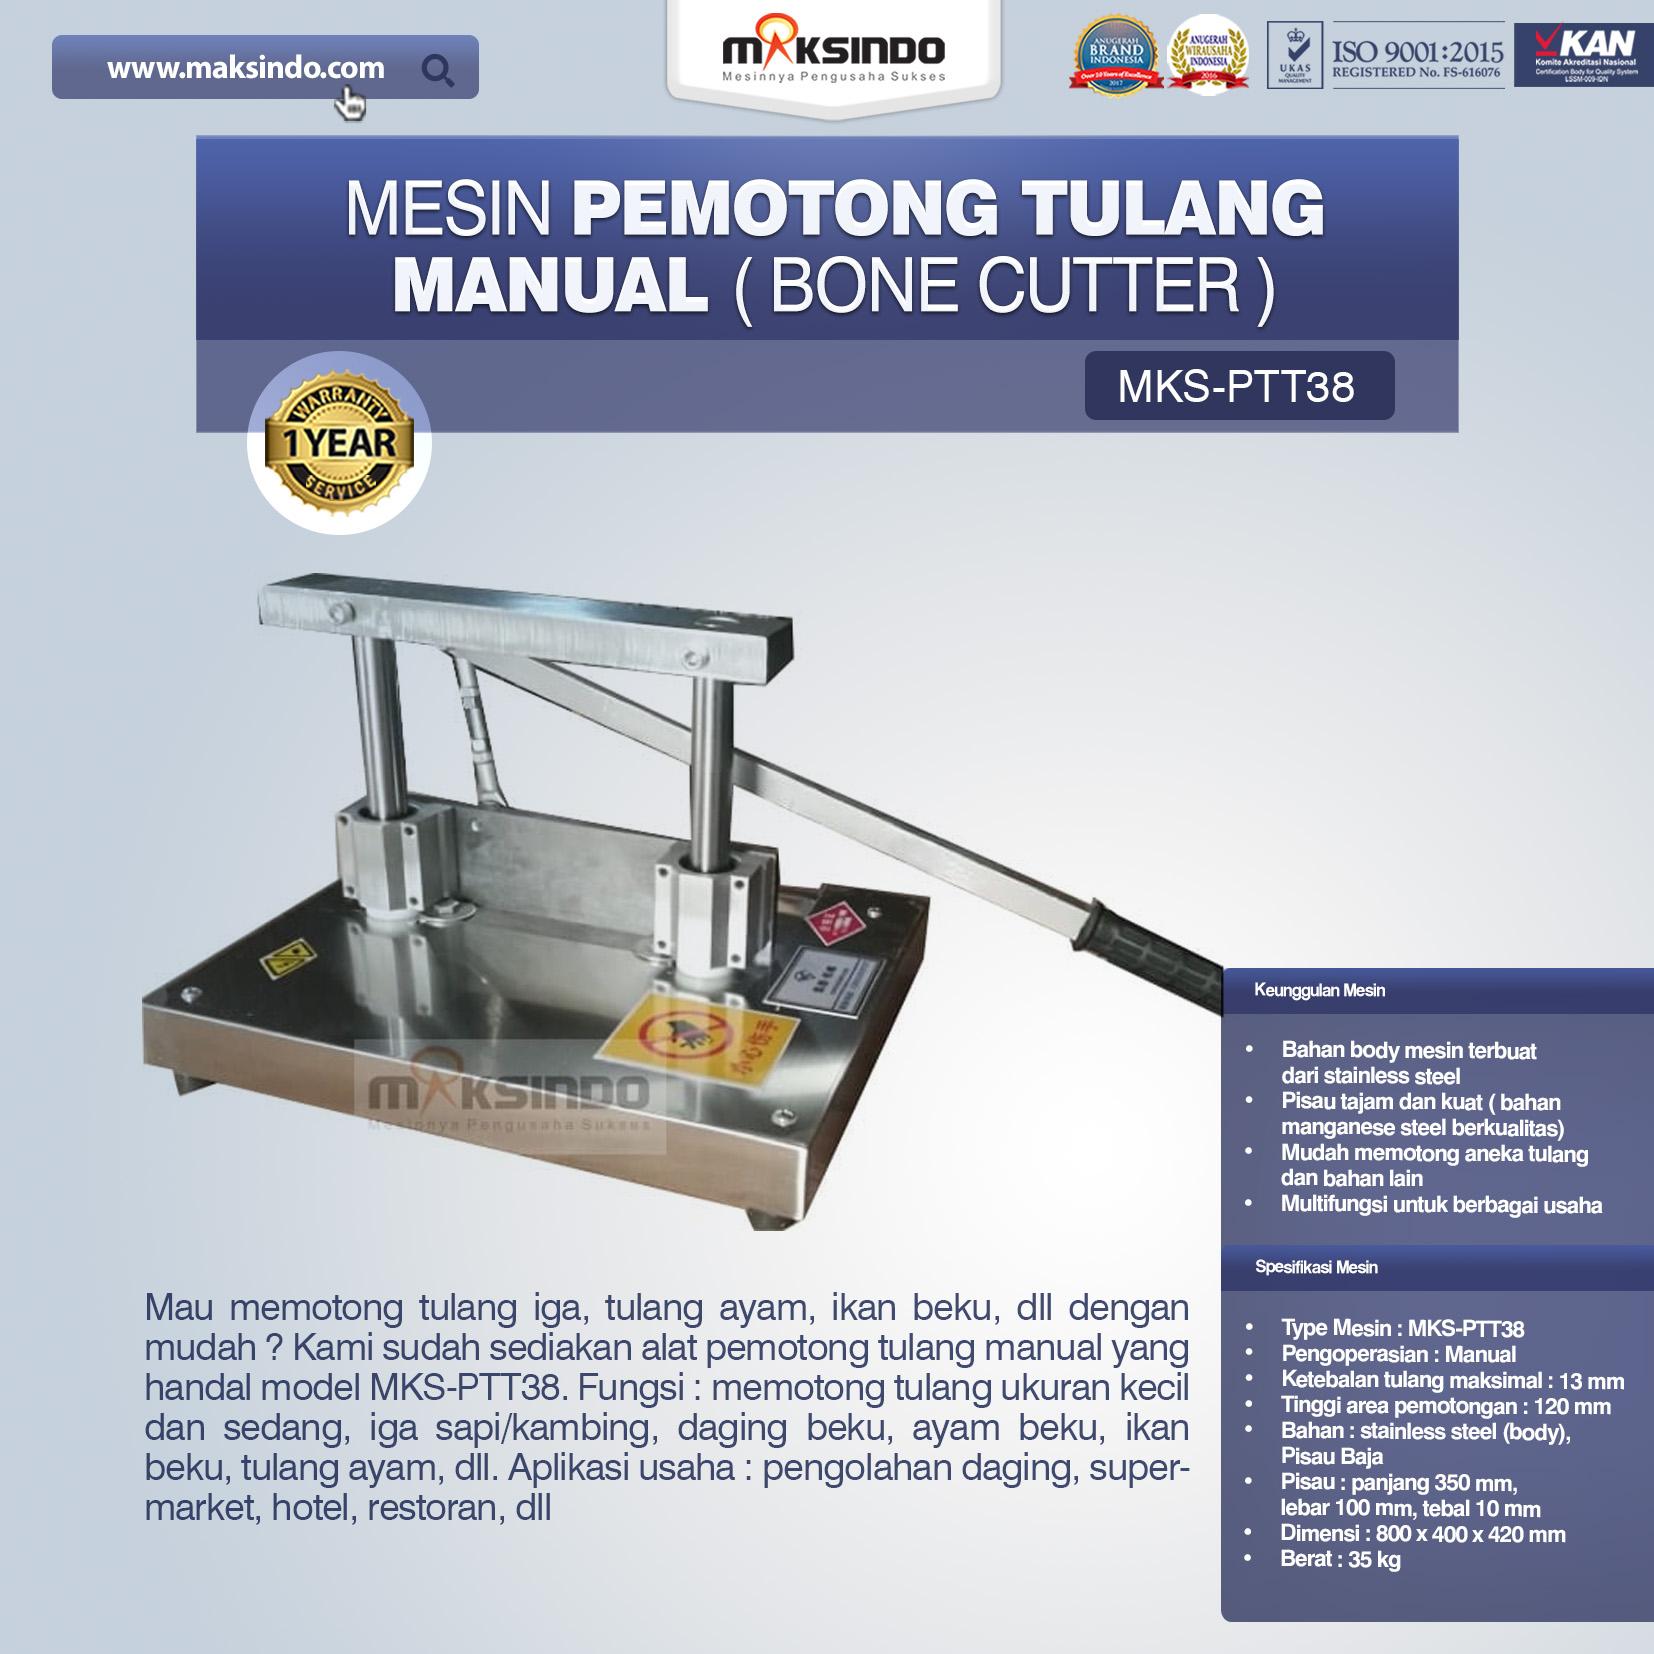 Jual Pemotong Tulang Manual (PTT38) di Tangerang